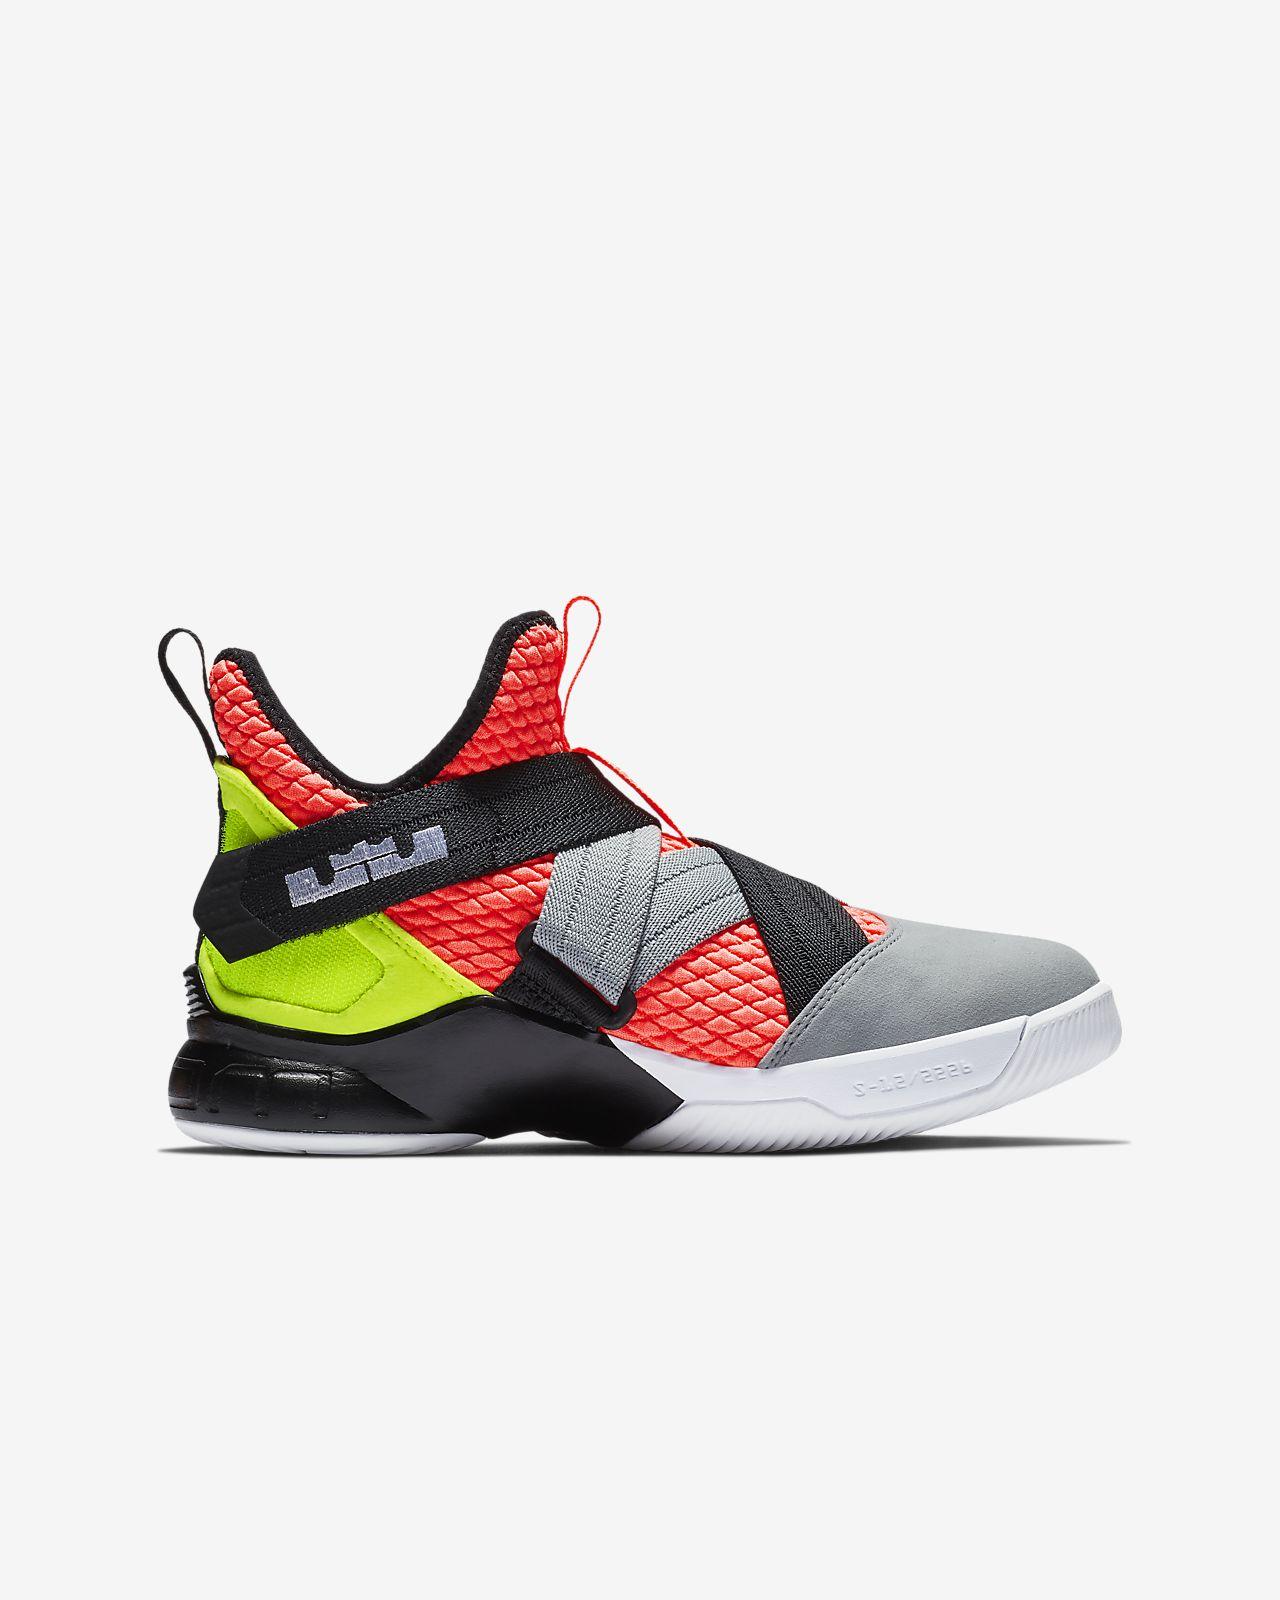 big sale 97a02 48f17 ... LeBron Soldier 12 SFG Big Kids  Basketball Shoe